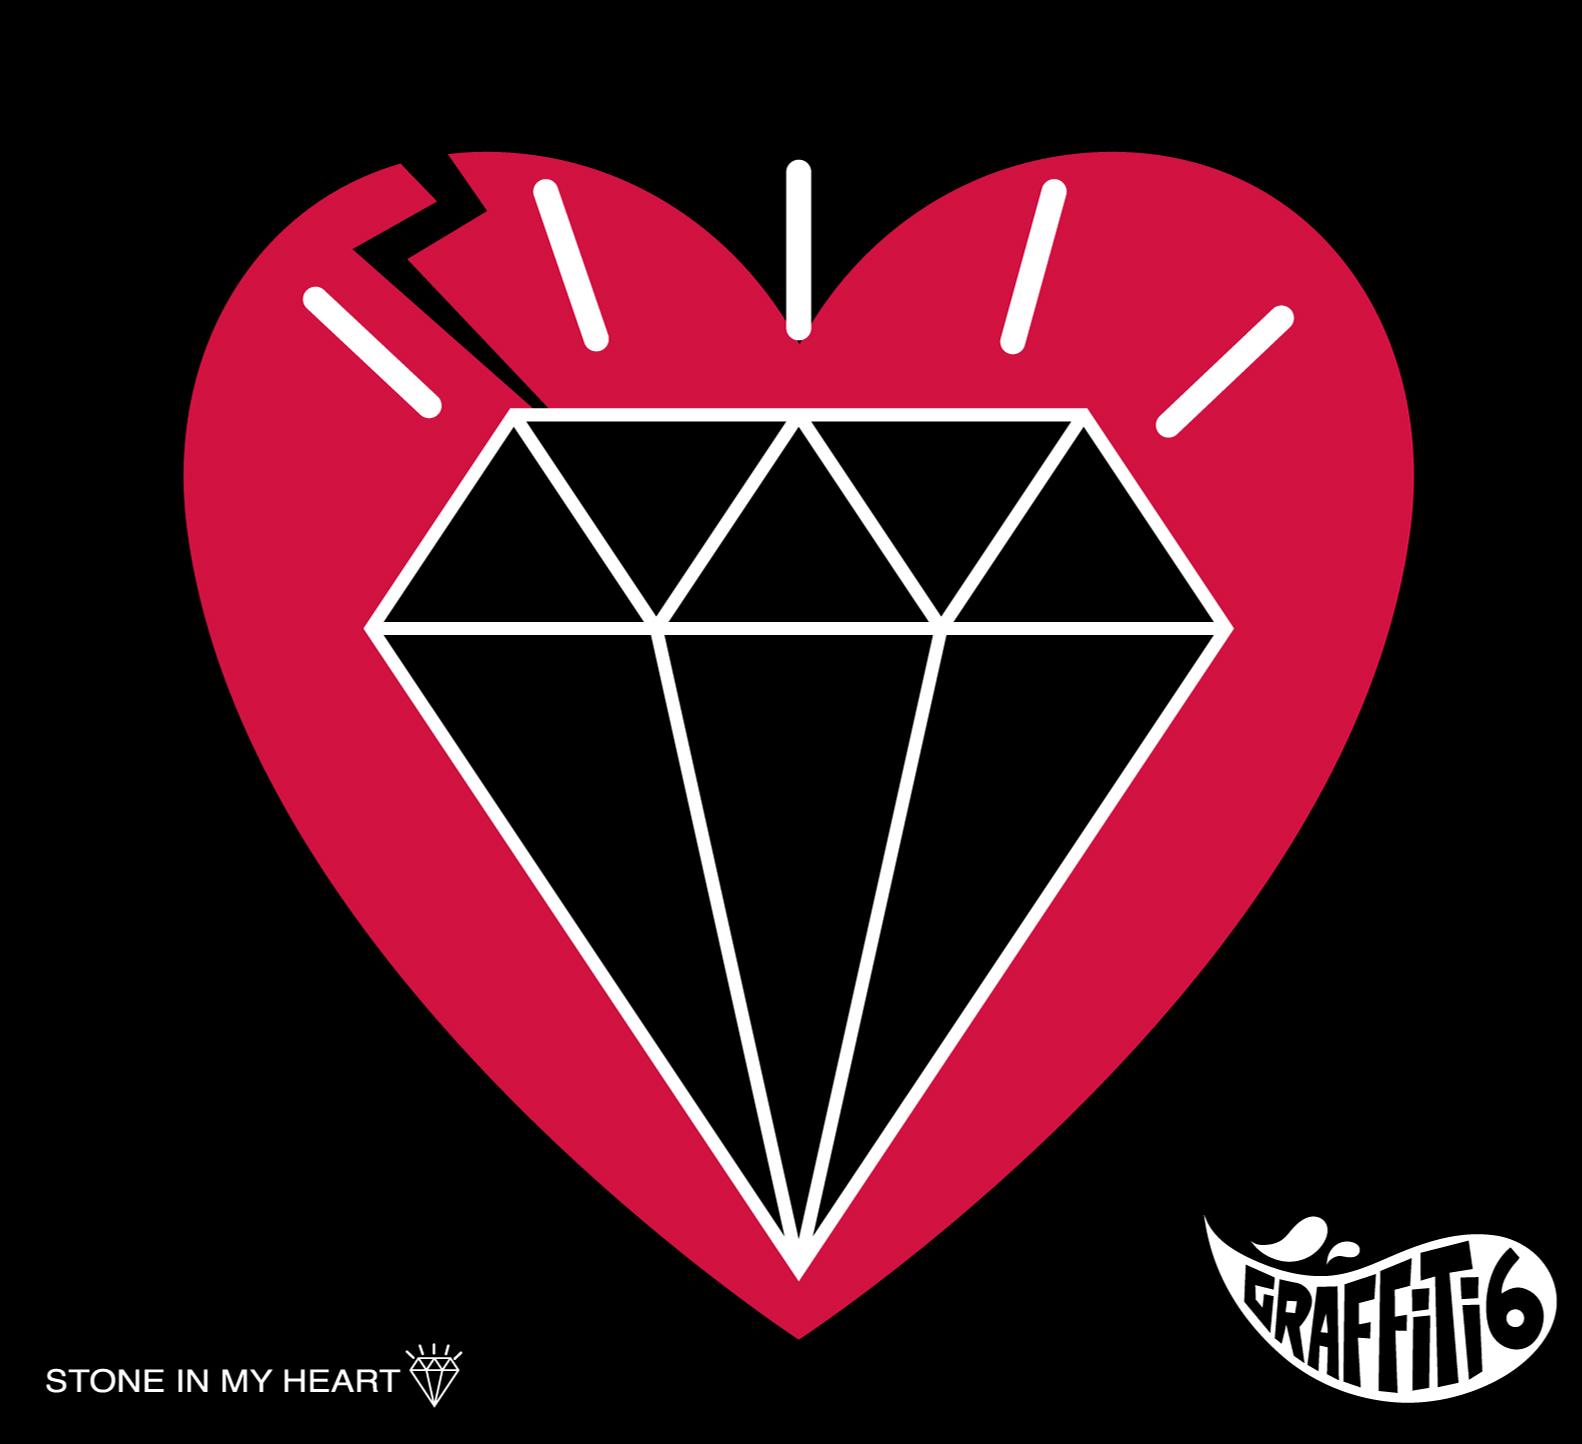 Graffiti6 - Stone in My Heart - EP (Official Album Cover).jpg